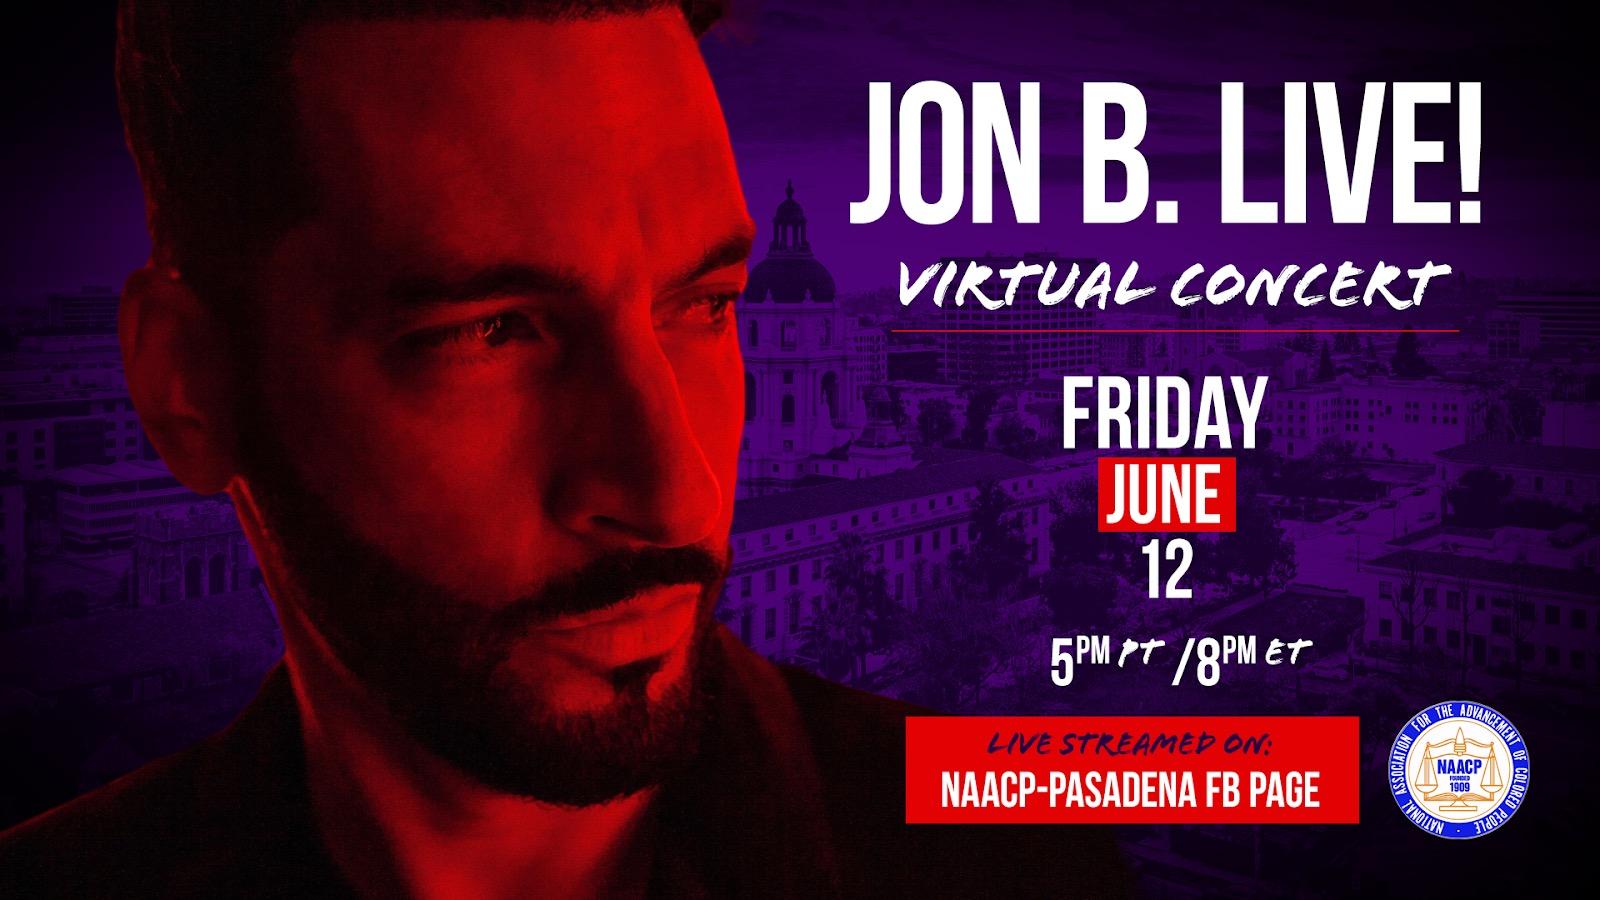 Jon B. Live Concert flyer